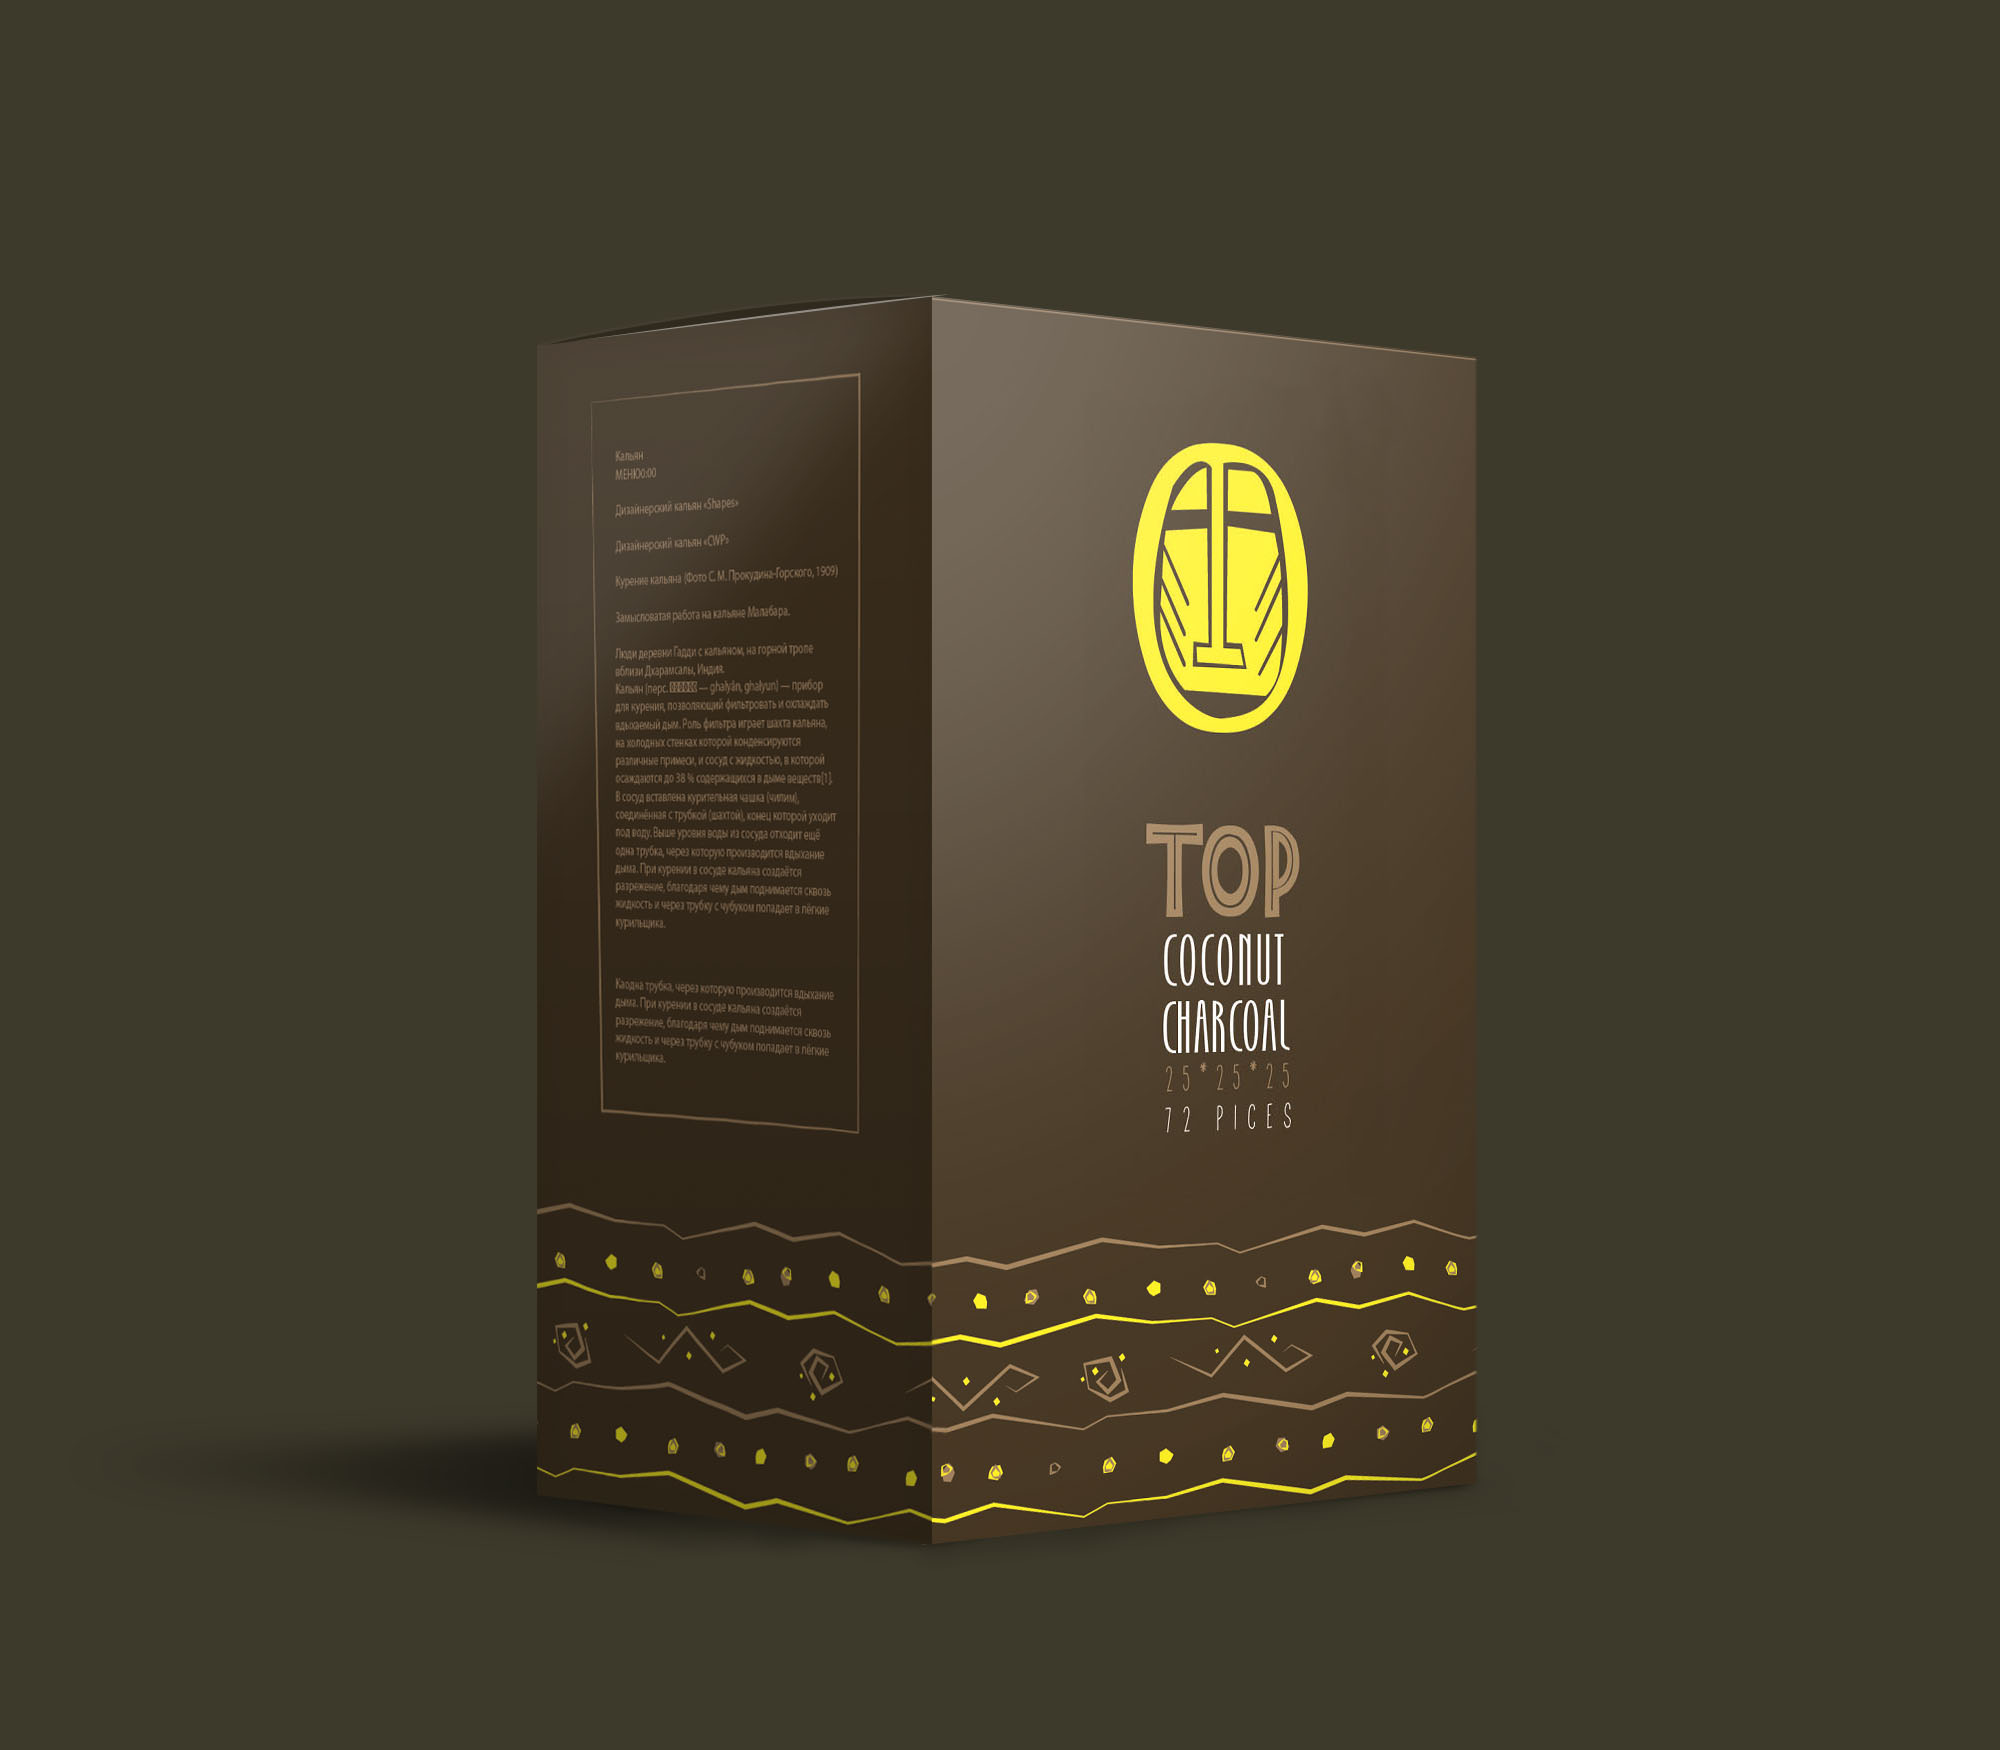 Разработка дизайна коробки, фирменного стиля, логотипа. фото f_7415c627beba8744.jpg